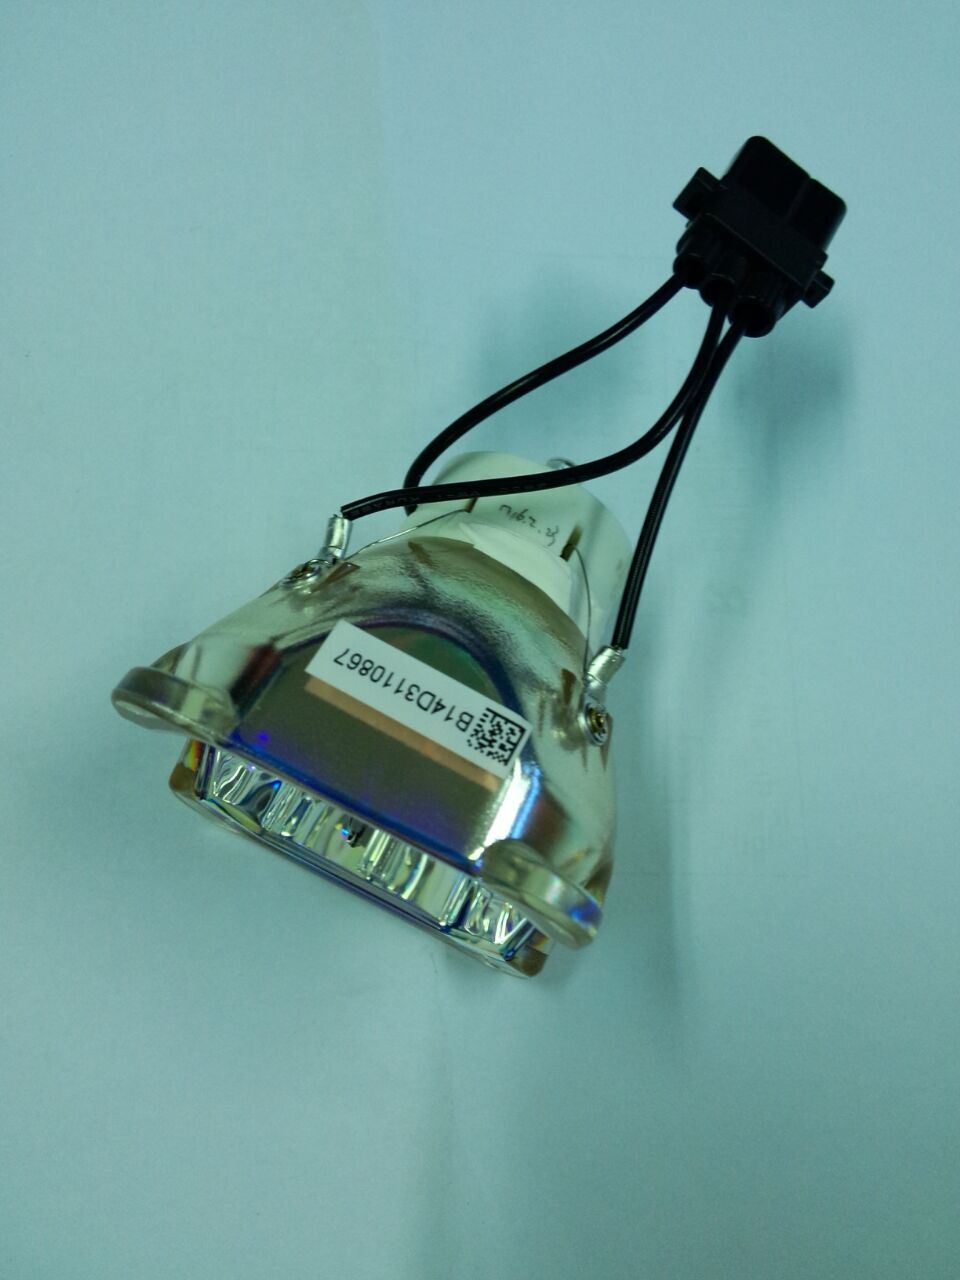 все цены на  Original projector lamp POA-LMP111 for Sanyo PLC-WXU30/PLC-XU101/PLC-XU105/PLC-XU1050C/PLC-XU111/PLC-XU115/PLC-XU116/PLC-XU106  онлайн